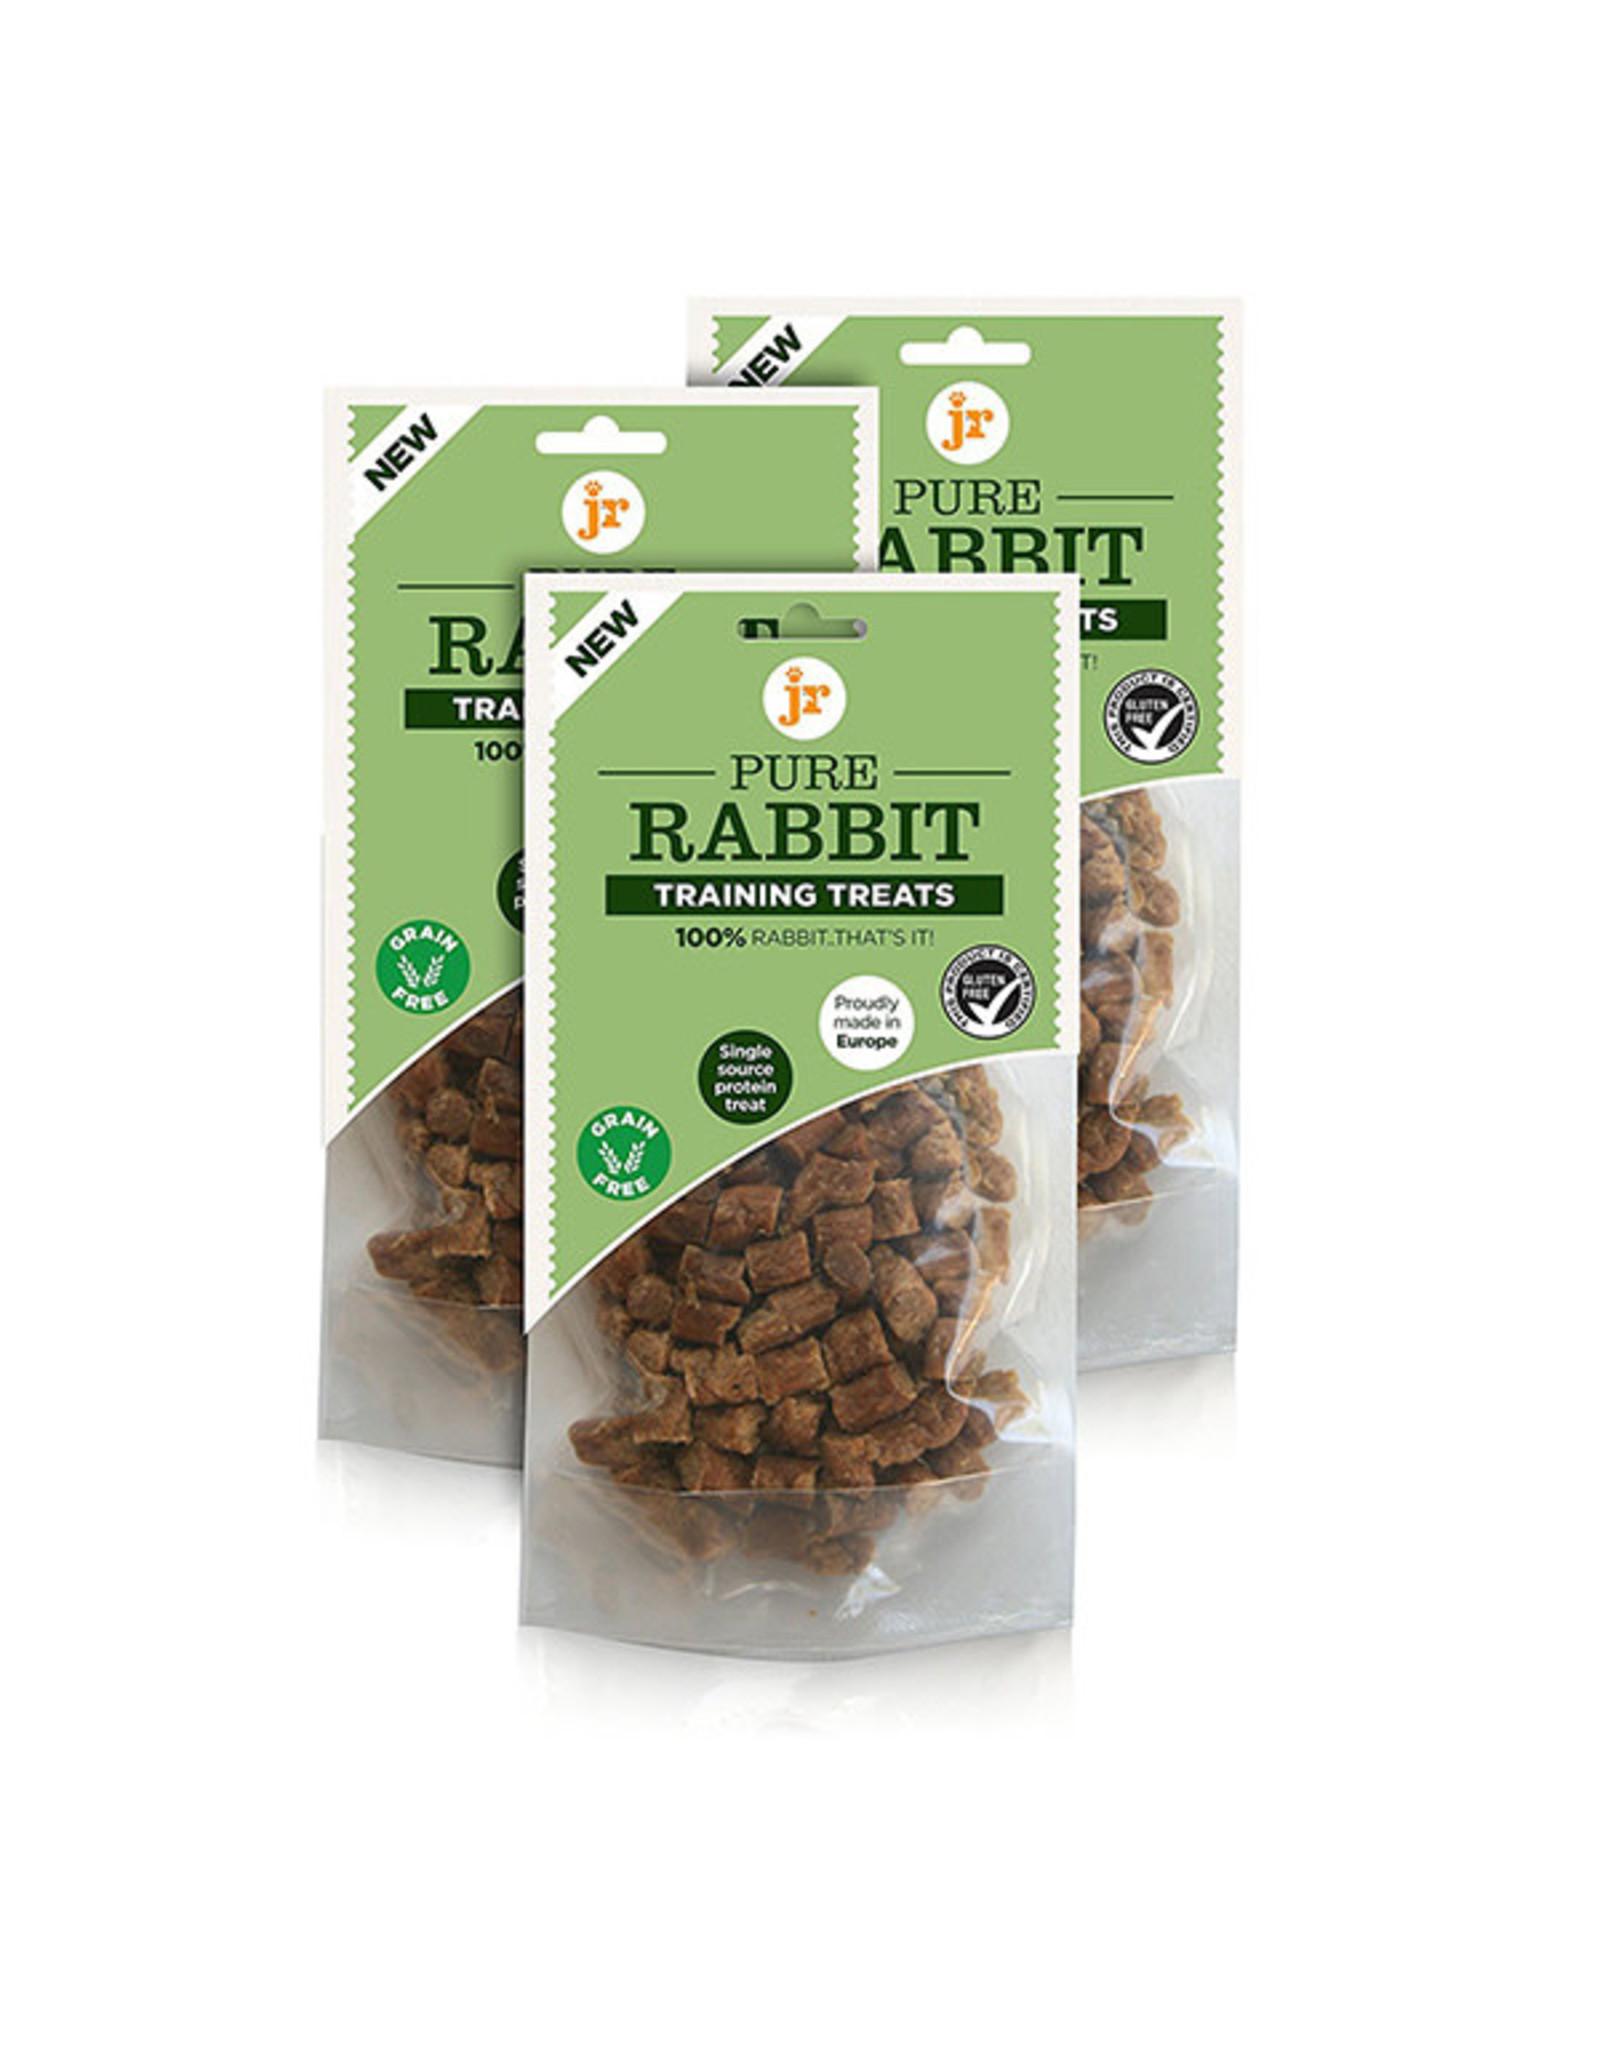 jr pet products Pure Rabbit Training Dog Treats, 85g